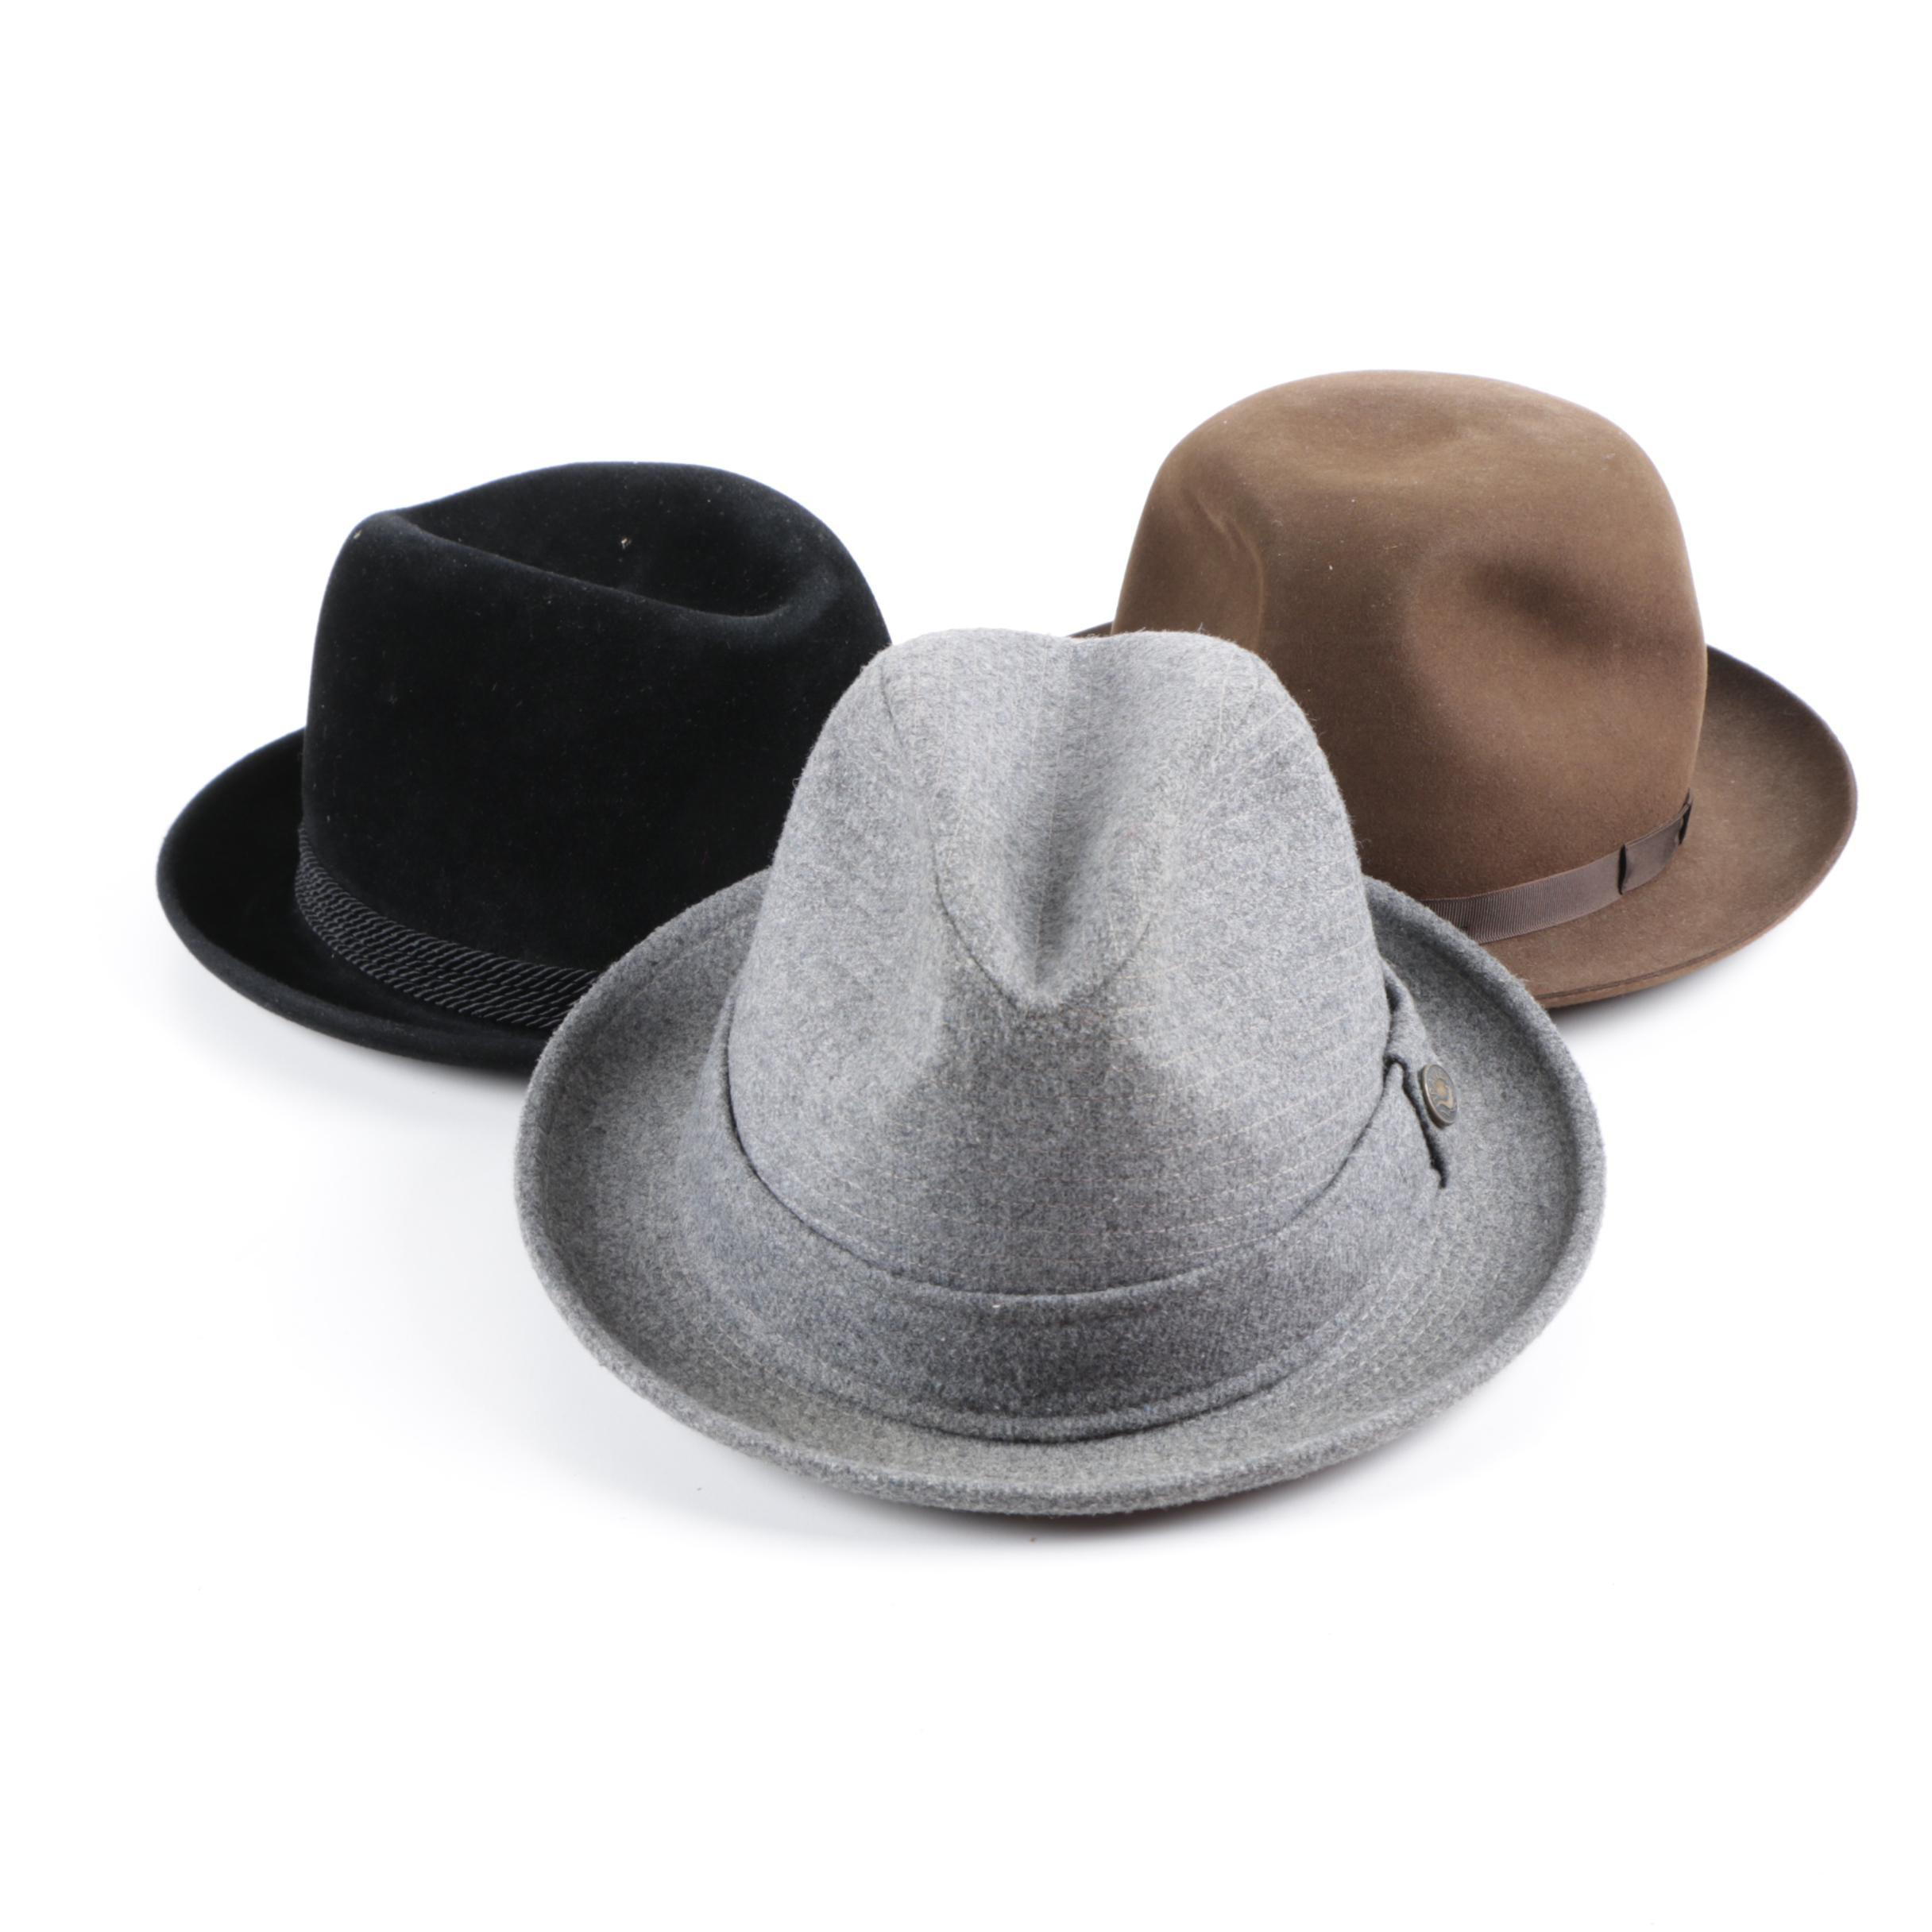 Vintage Fedora Hats Featuring Brooks Brothers